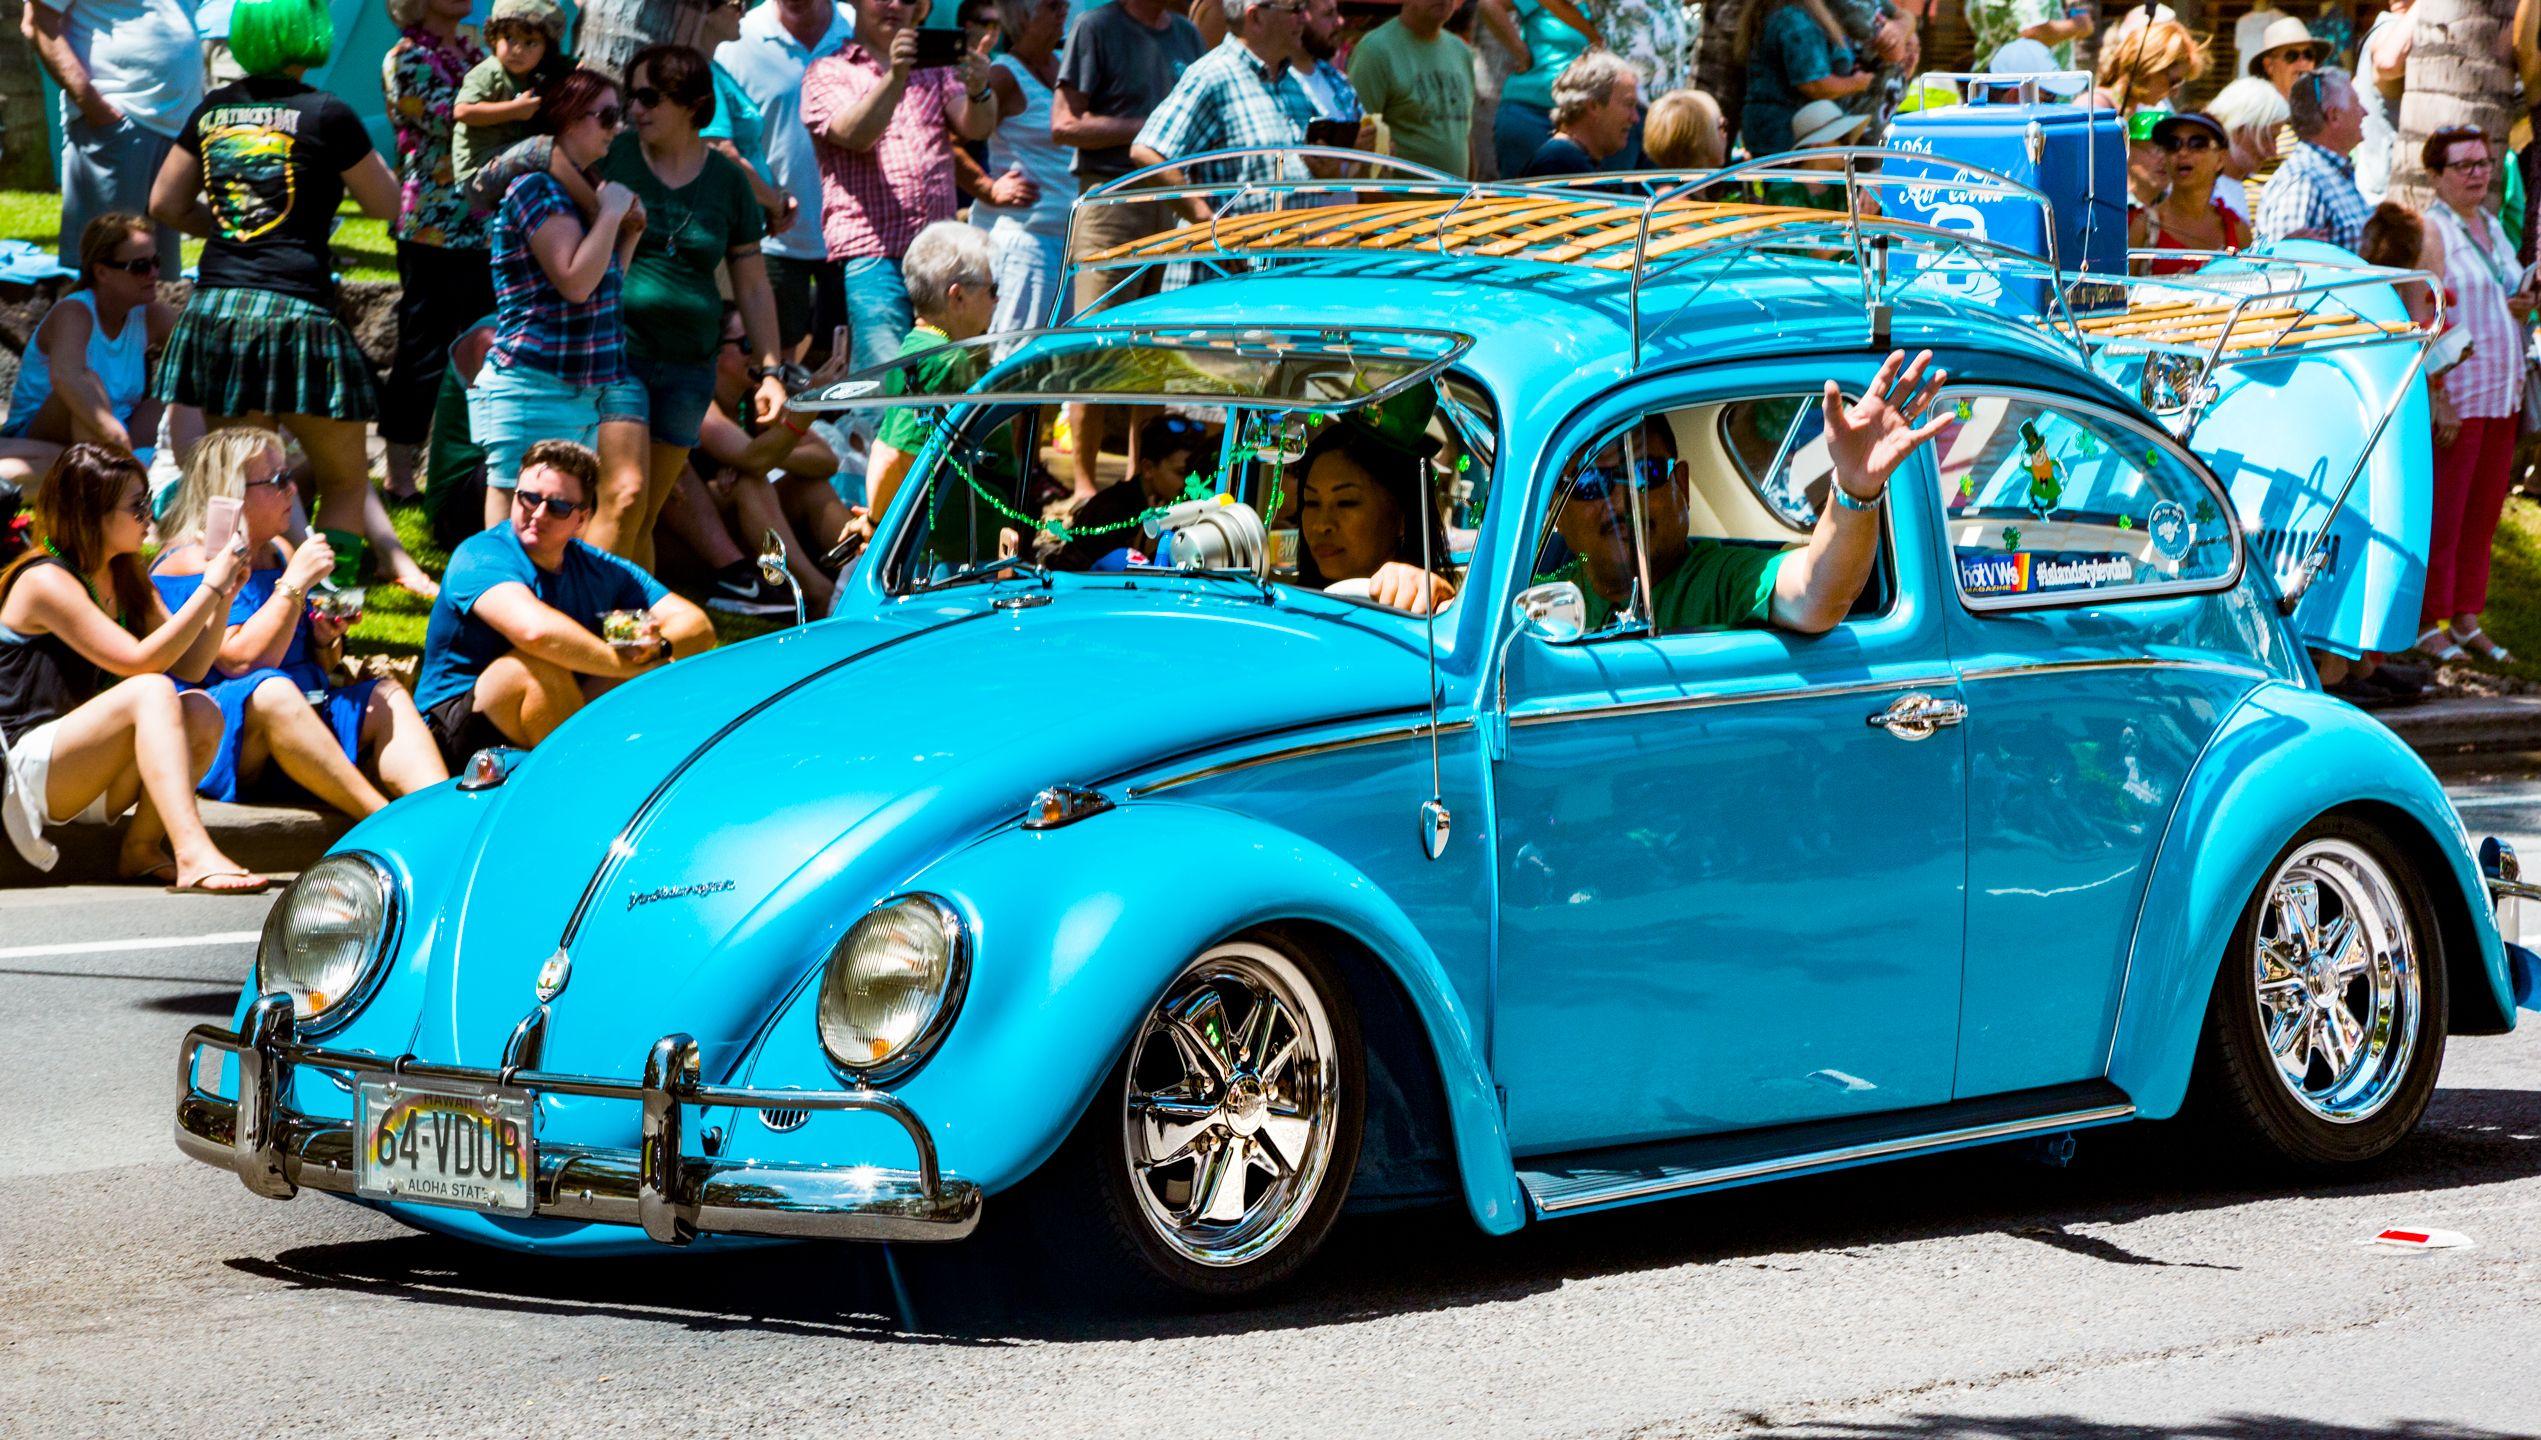 Some Pretty Cool Vws In Hawaii Islandstylevdub Honolulu Hawaii Waikiki Volkswagen Beetle St Patricks Day Parade Street Photography Photography Company